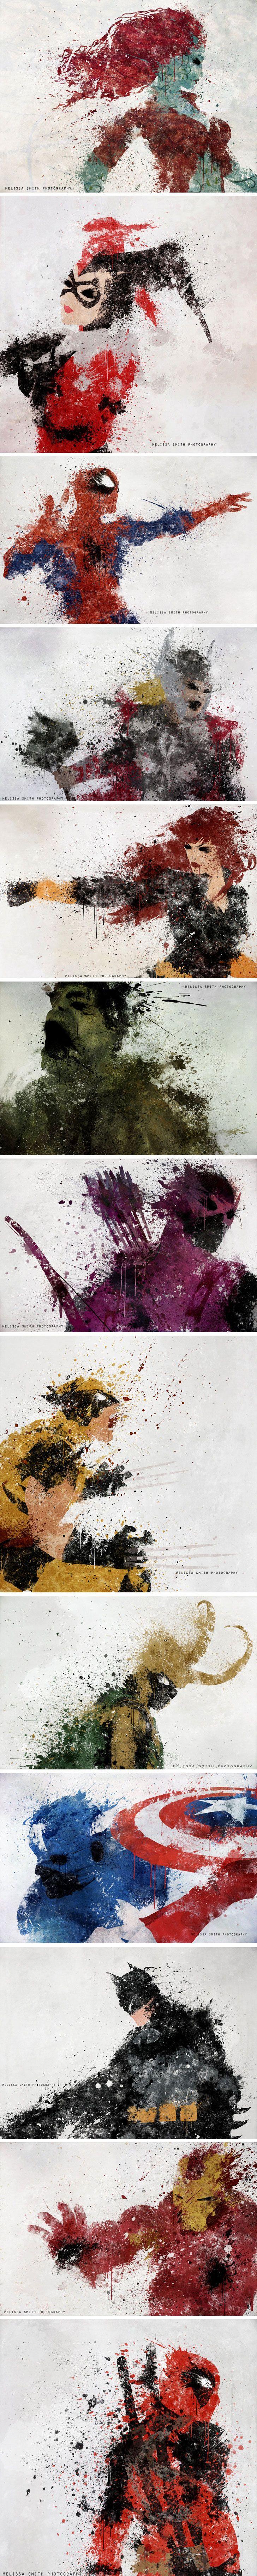 Melissa Smiths superhero splatter art.